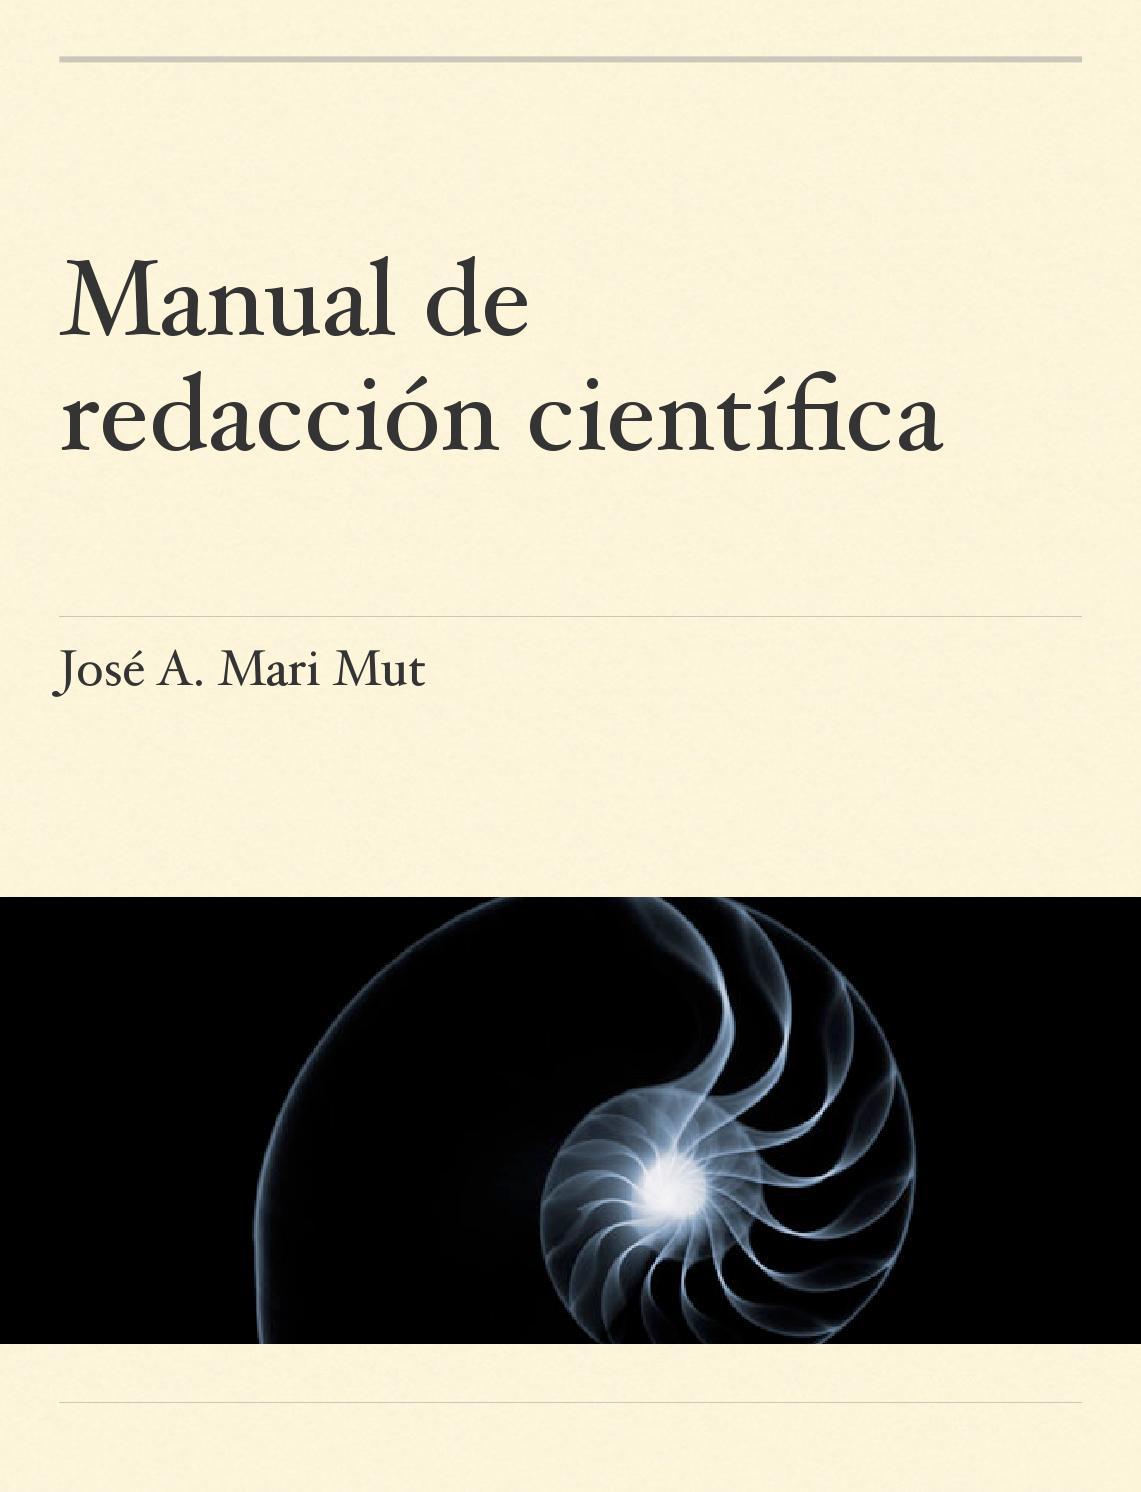 Mari mut jose a 2013 manual de redaccion cientifica by Instituto de ...